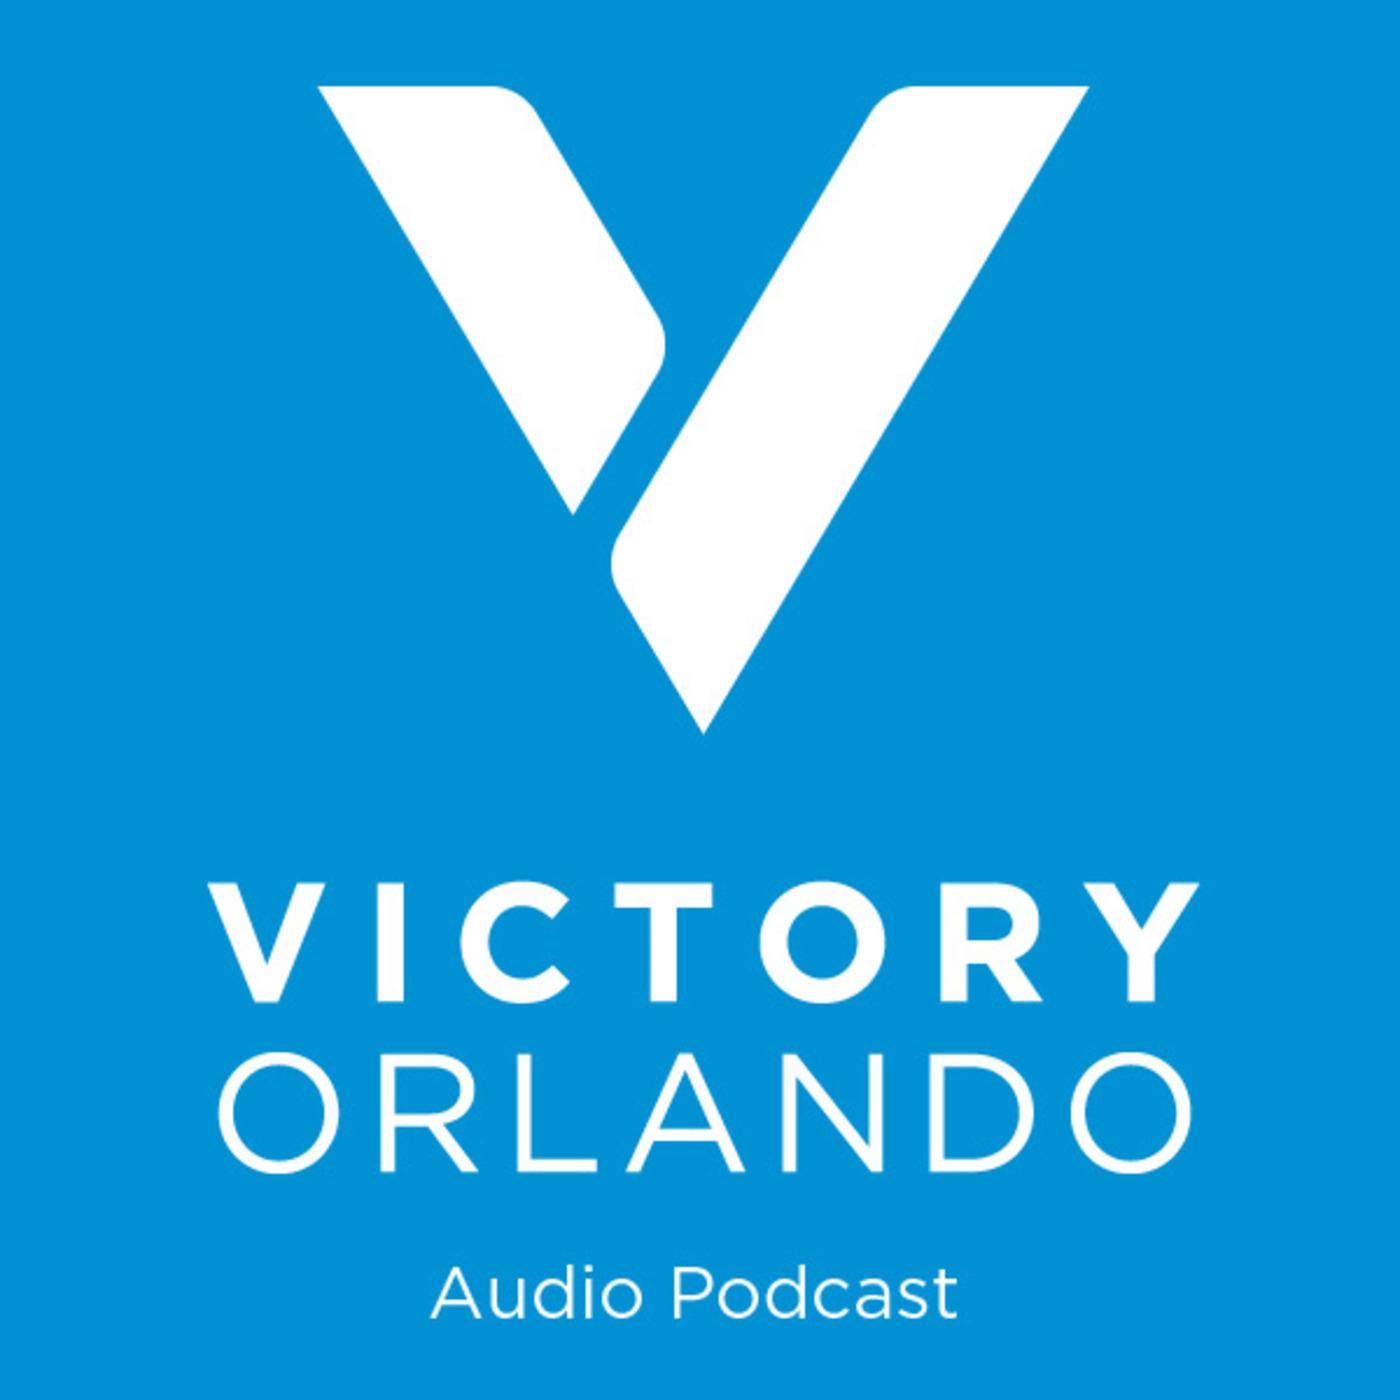 Victory Orlando Church Audio Podcast